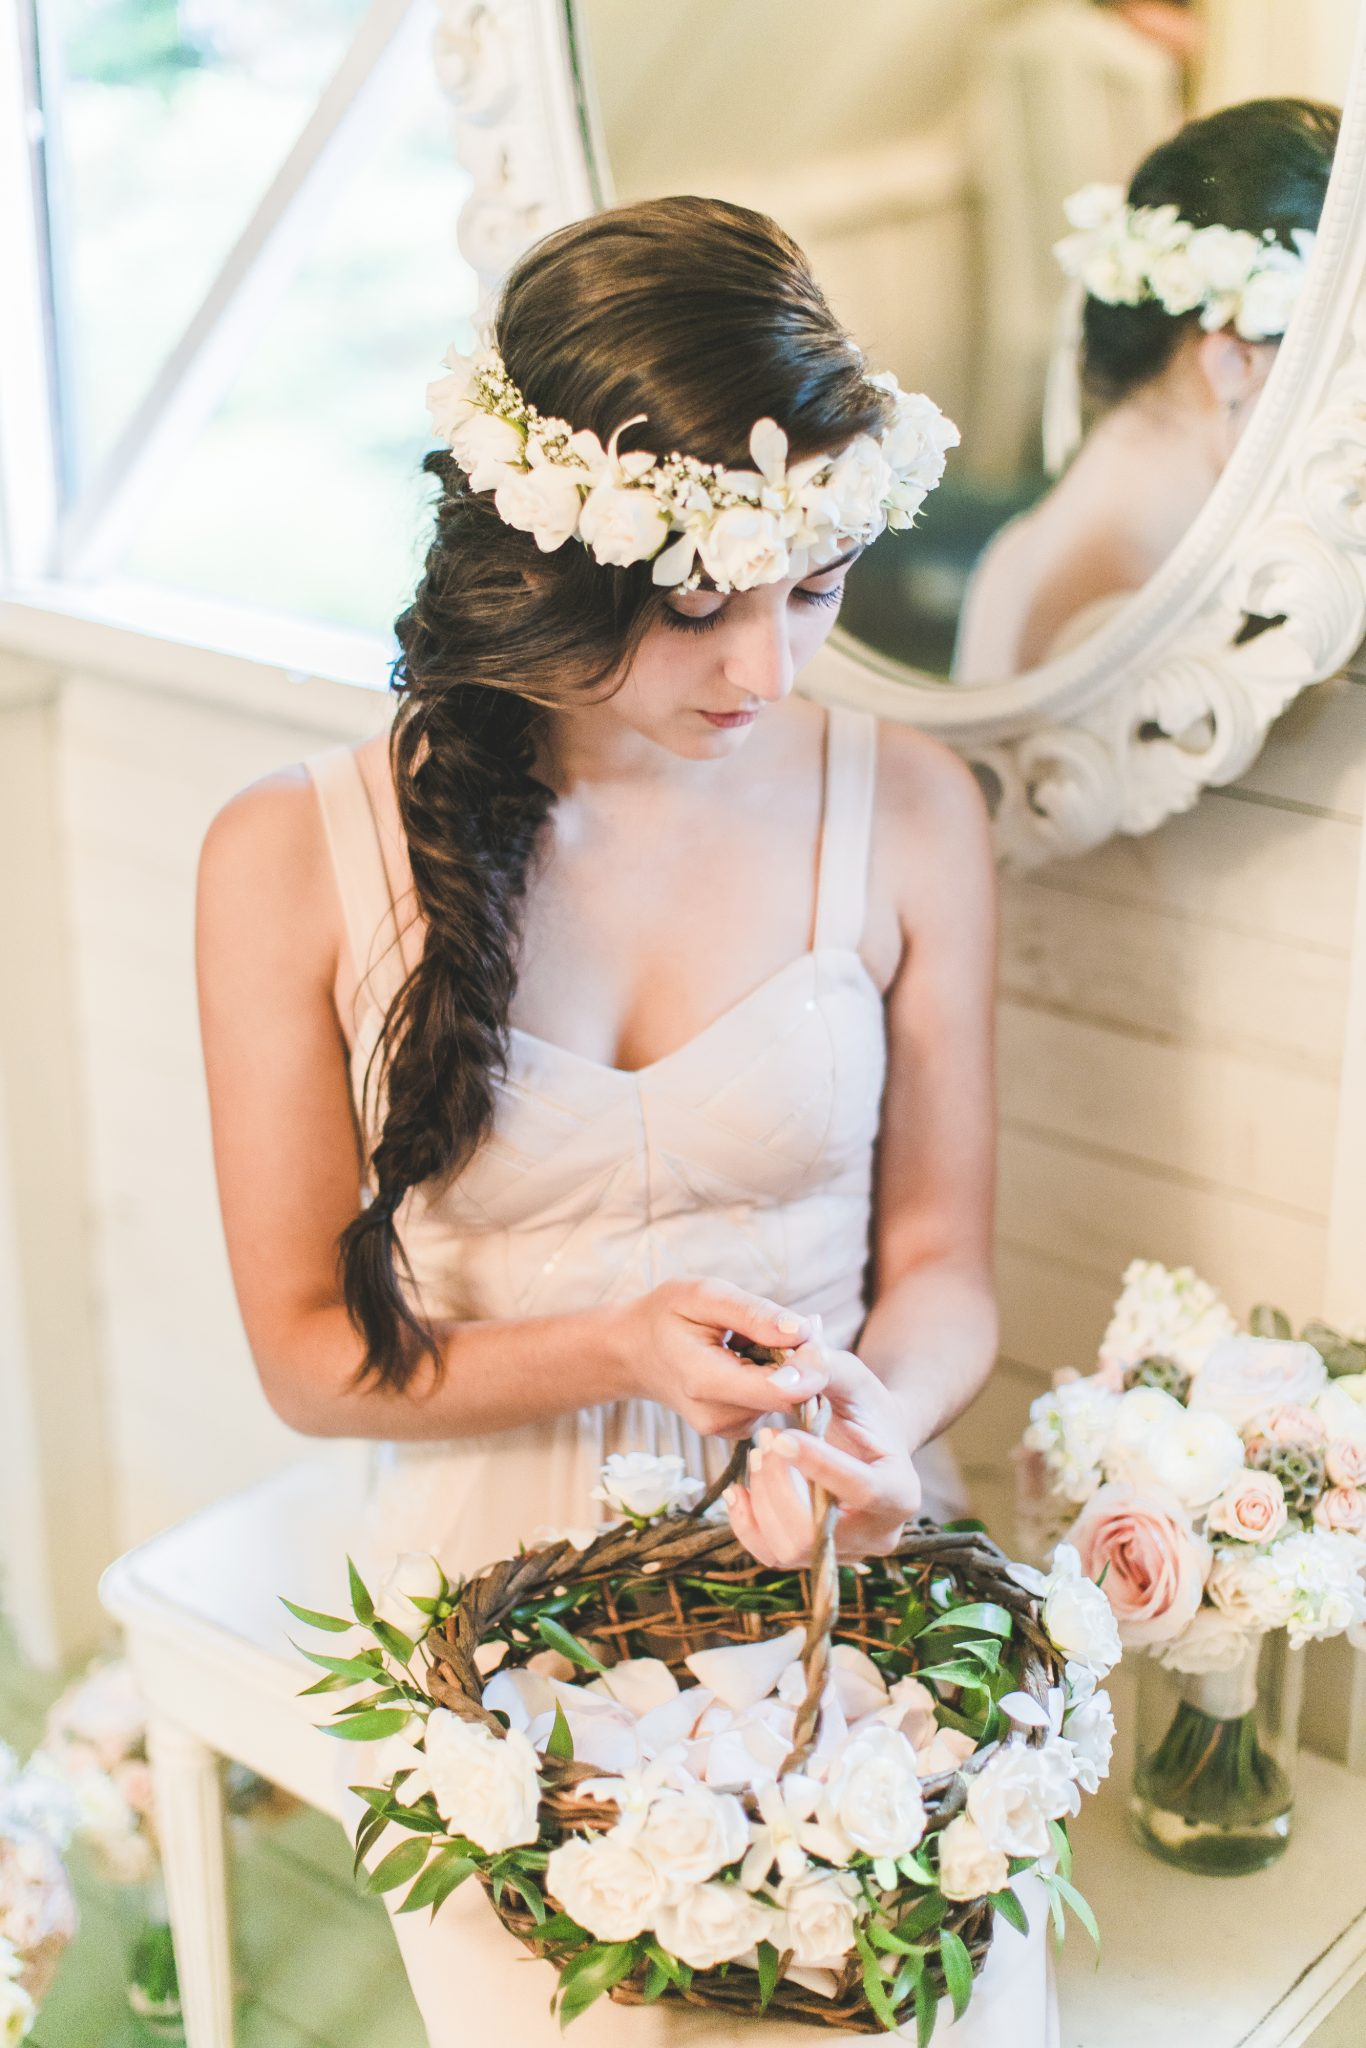 3seattle Floral Design Wedding Flower Girl Busket Halo Hair Flowers